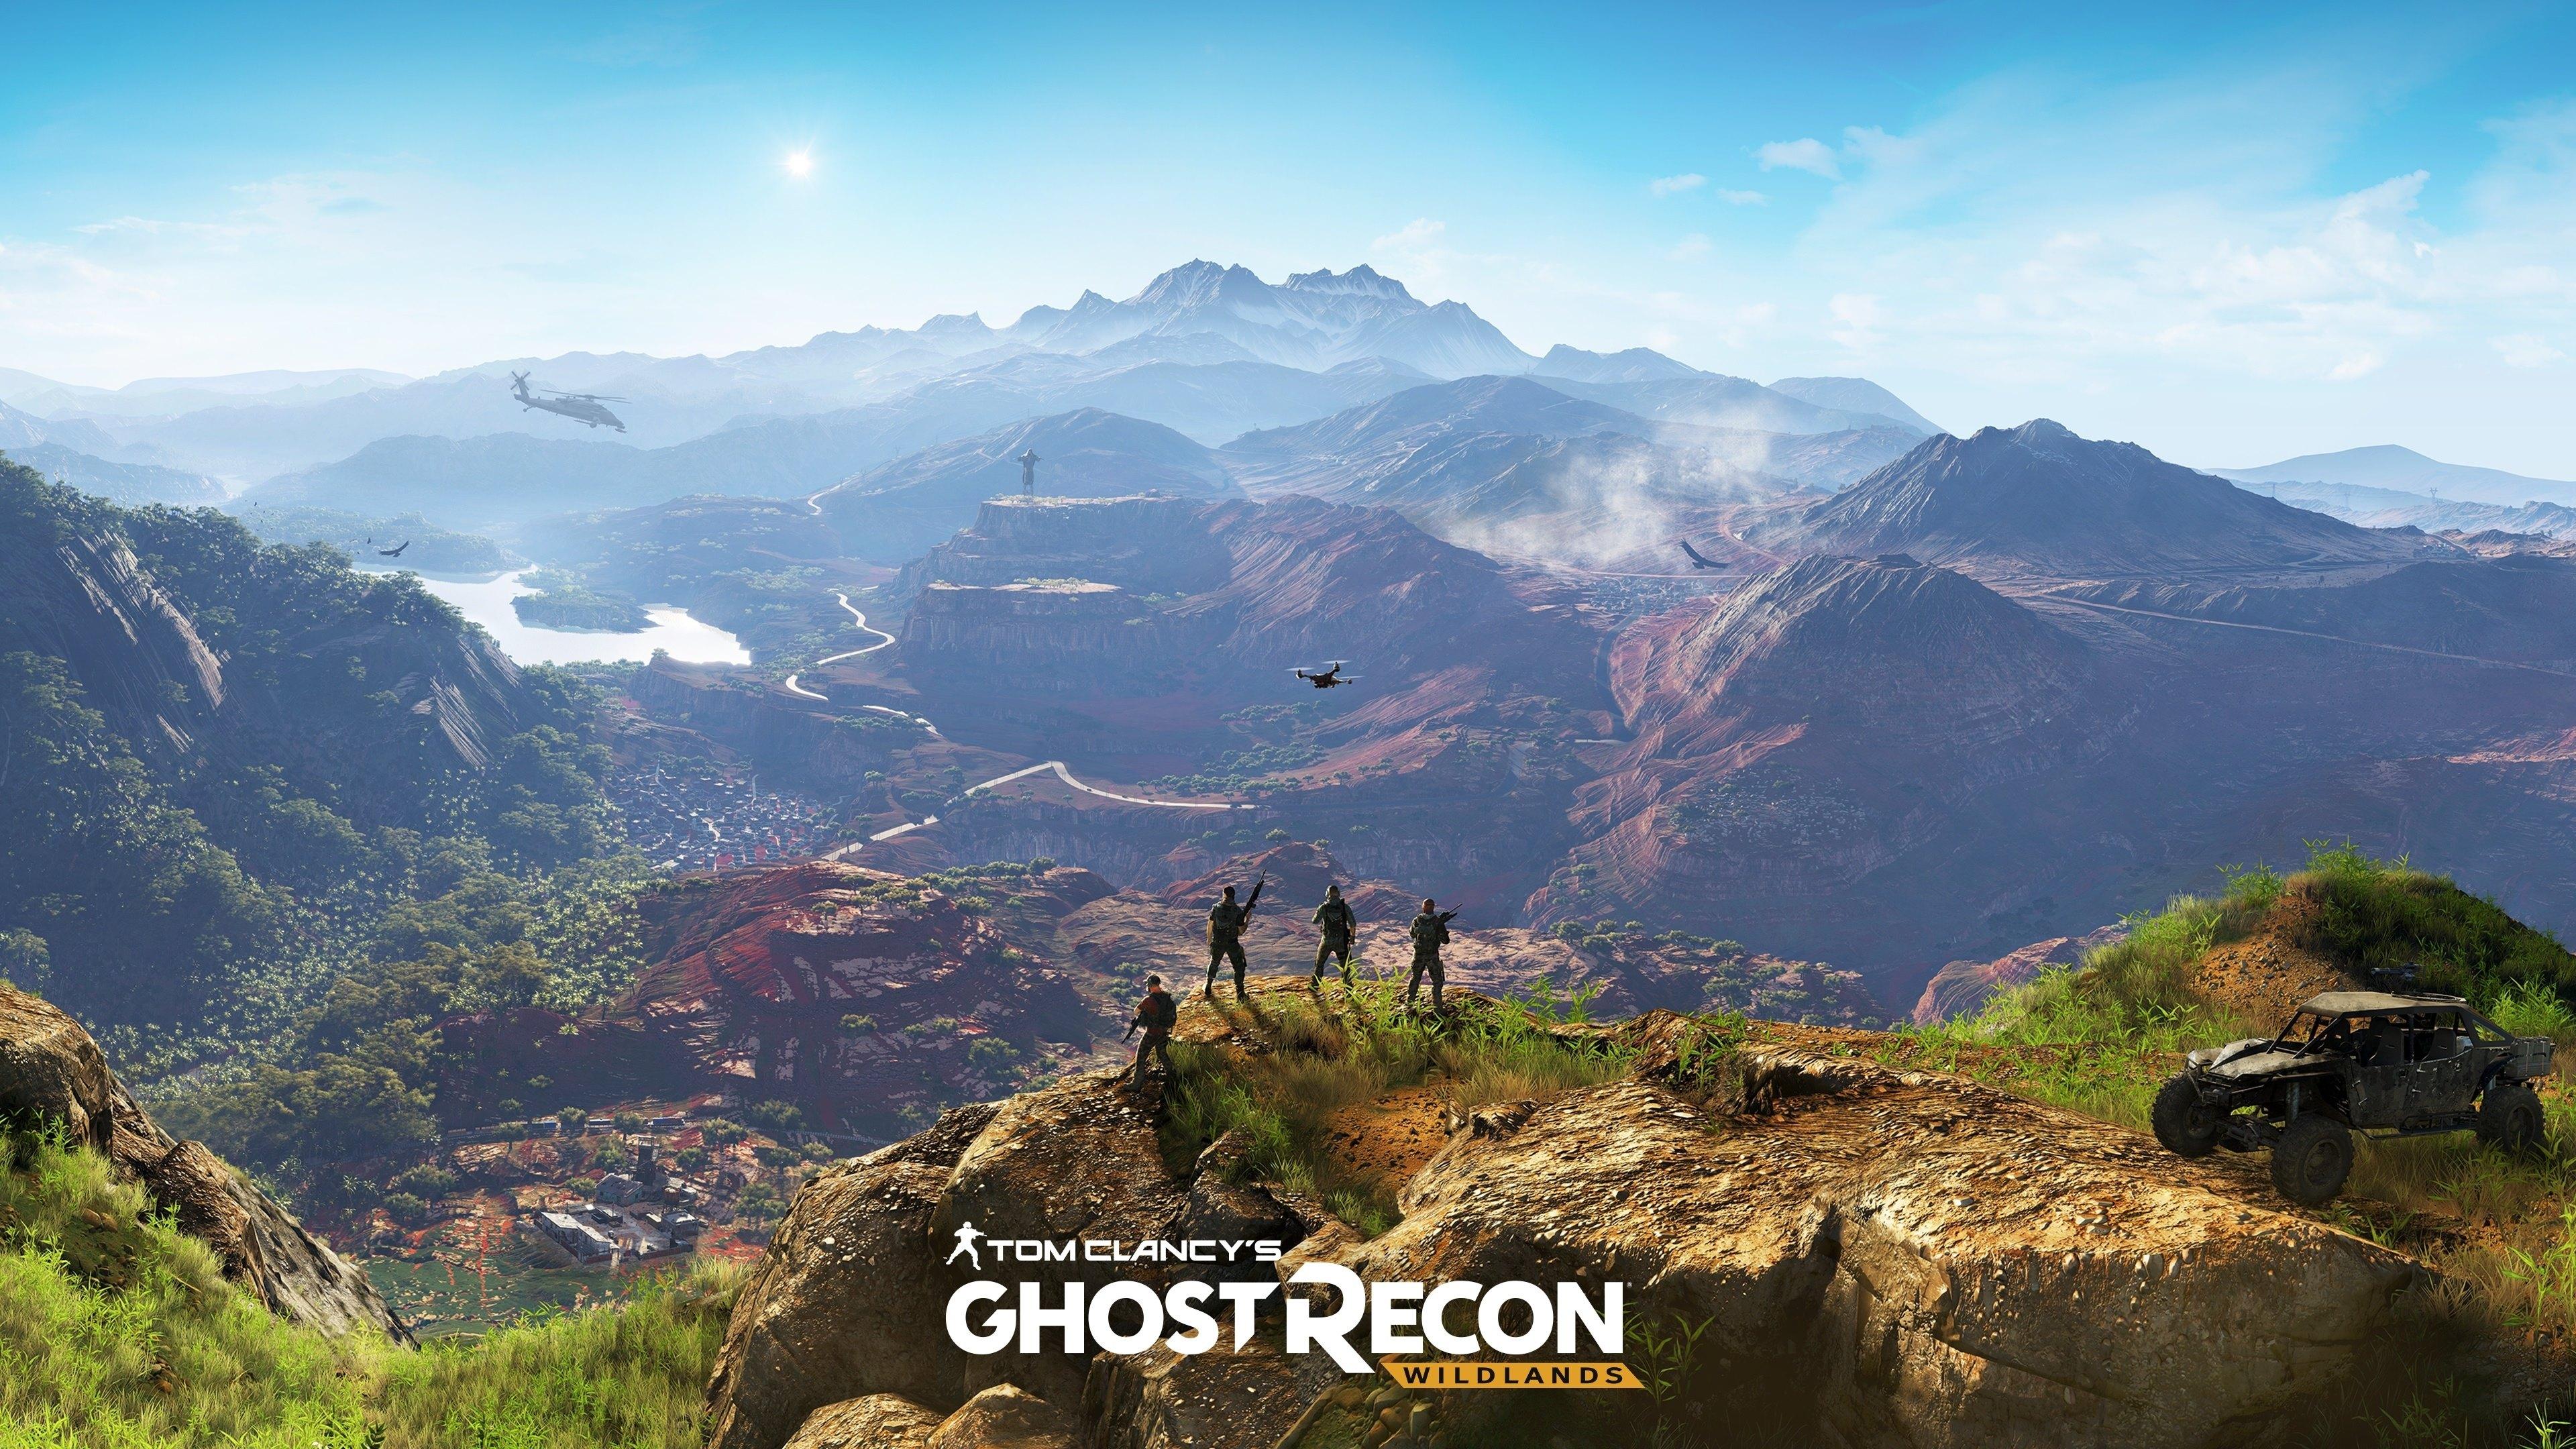 82 Tom Clancy S Ghost Recon Wildlands Hd Wallpapers Background